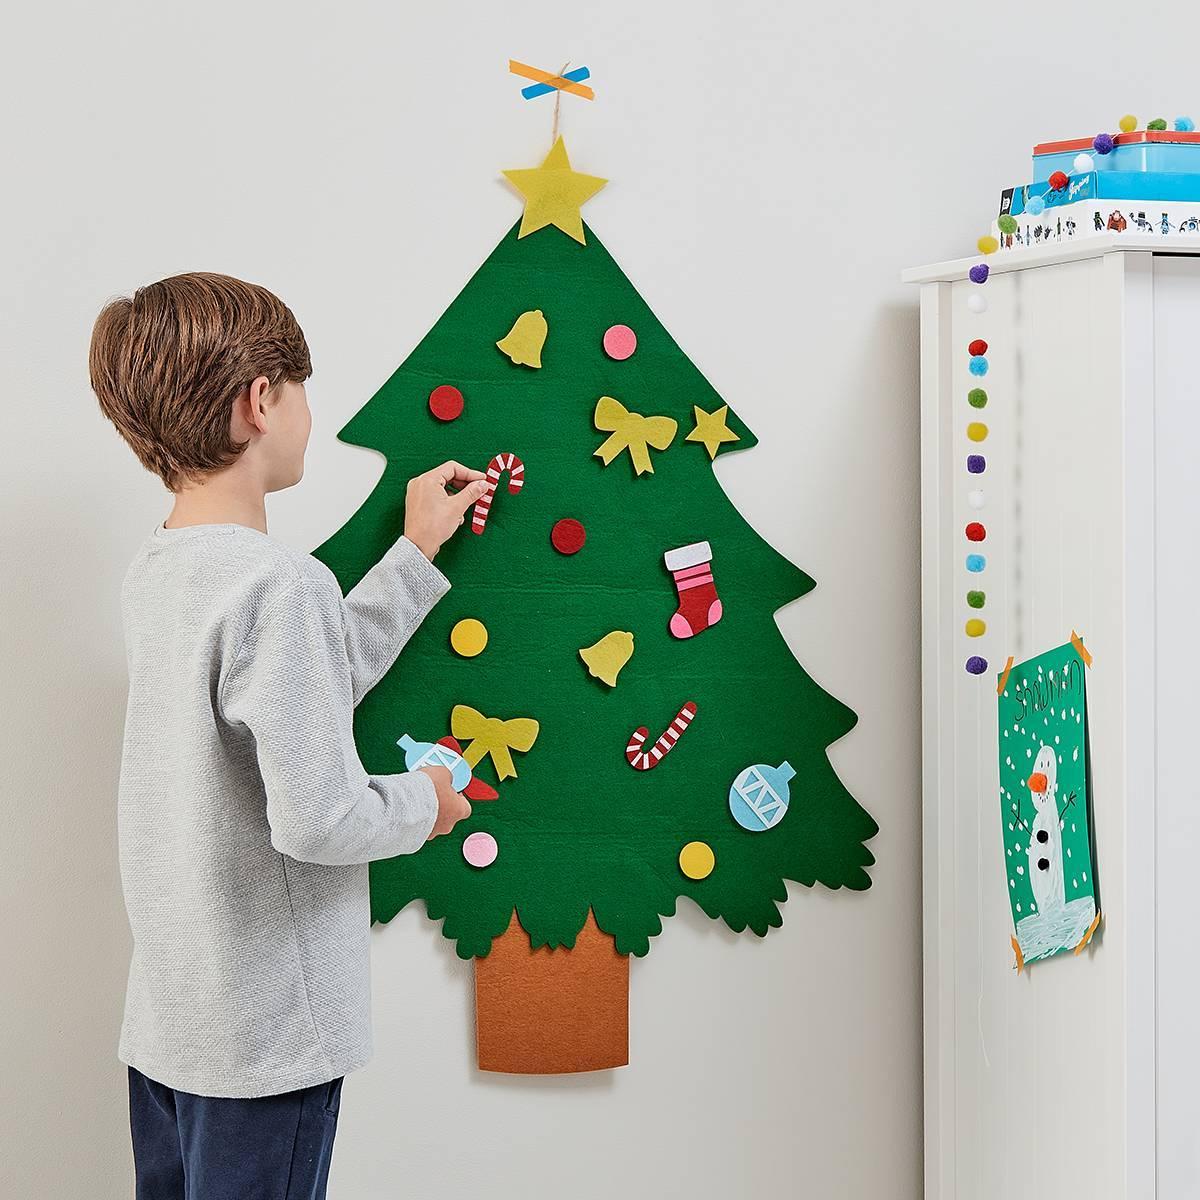 child decorating felt tree